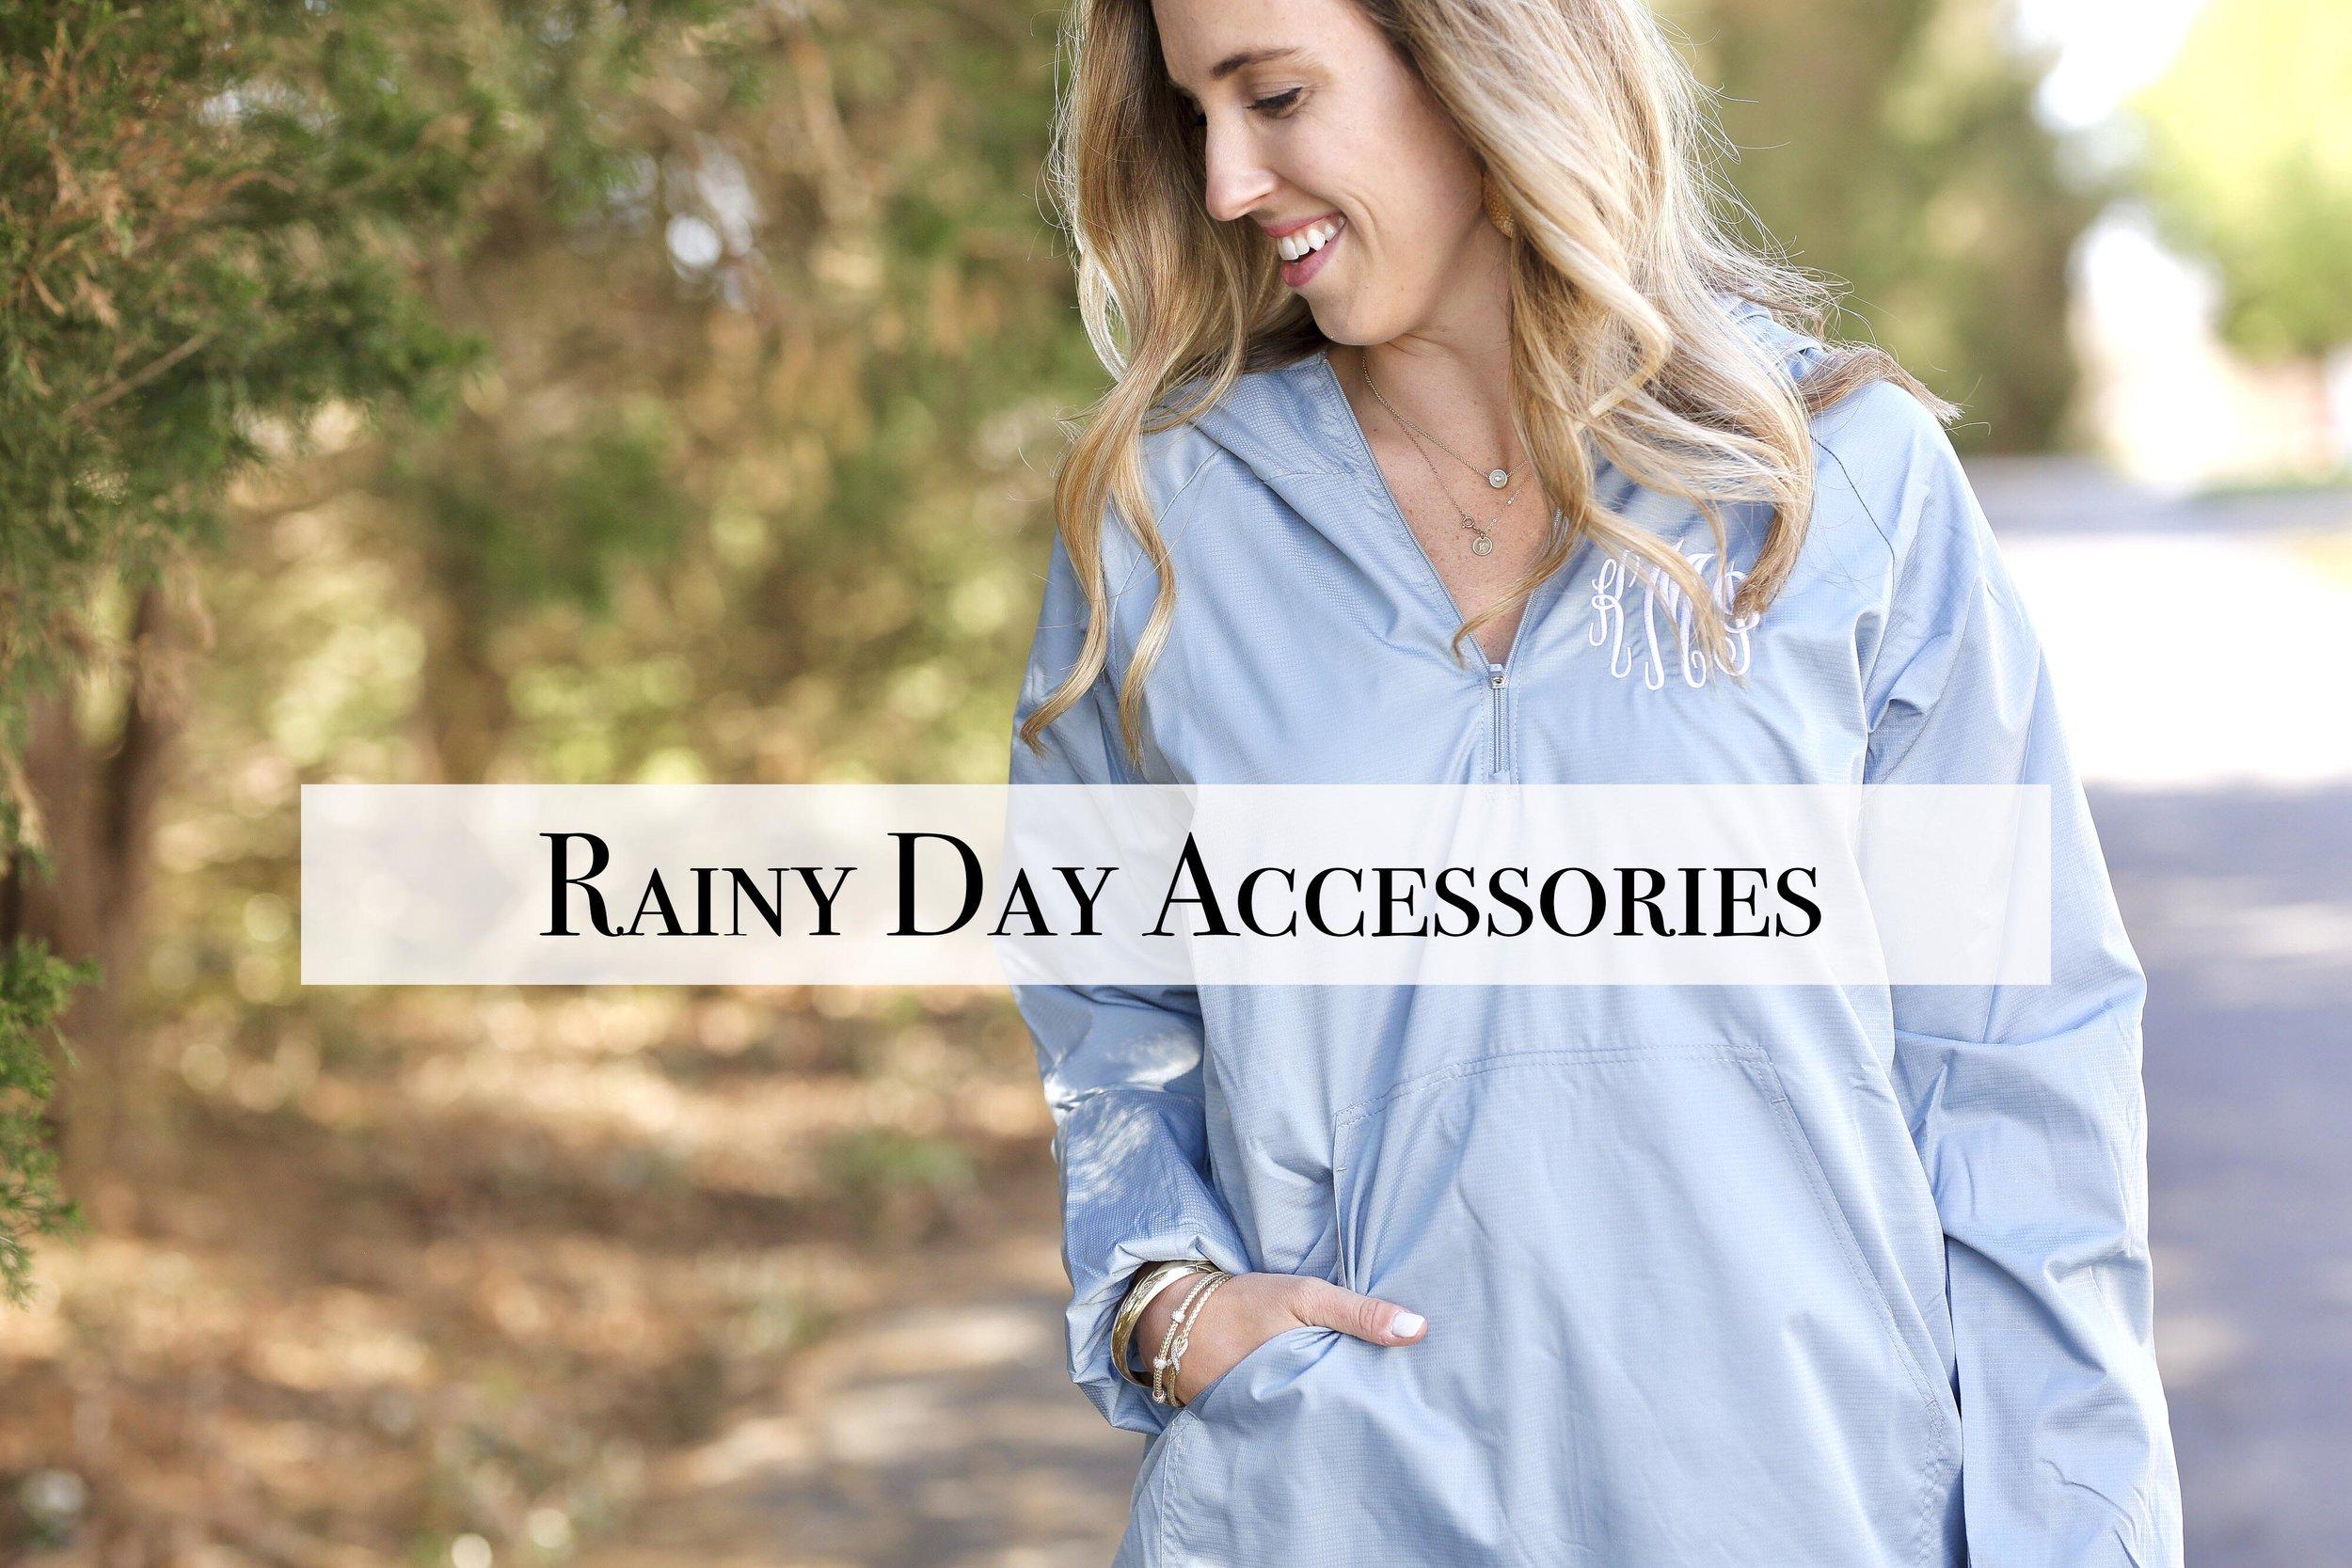 Rainy Day Accessories.jpg